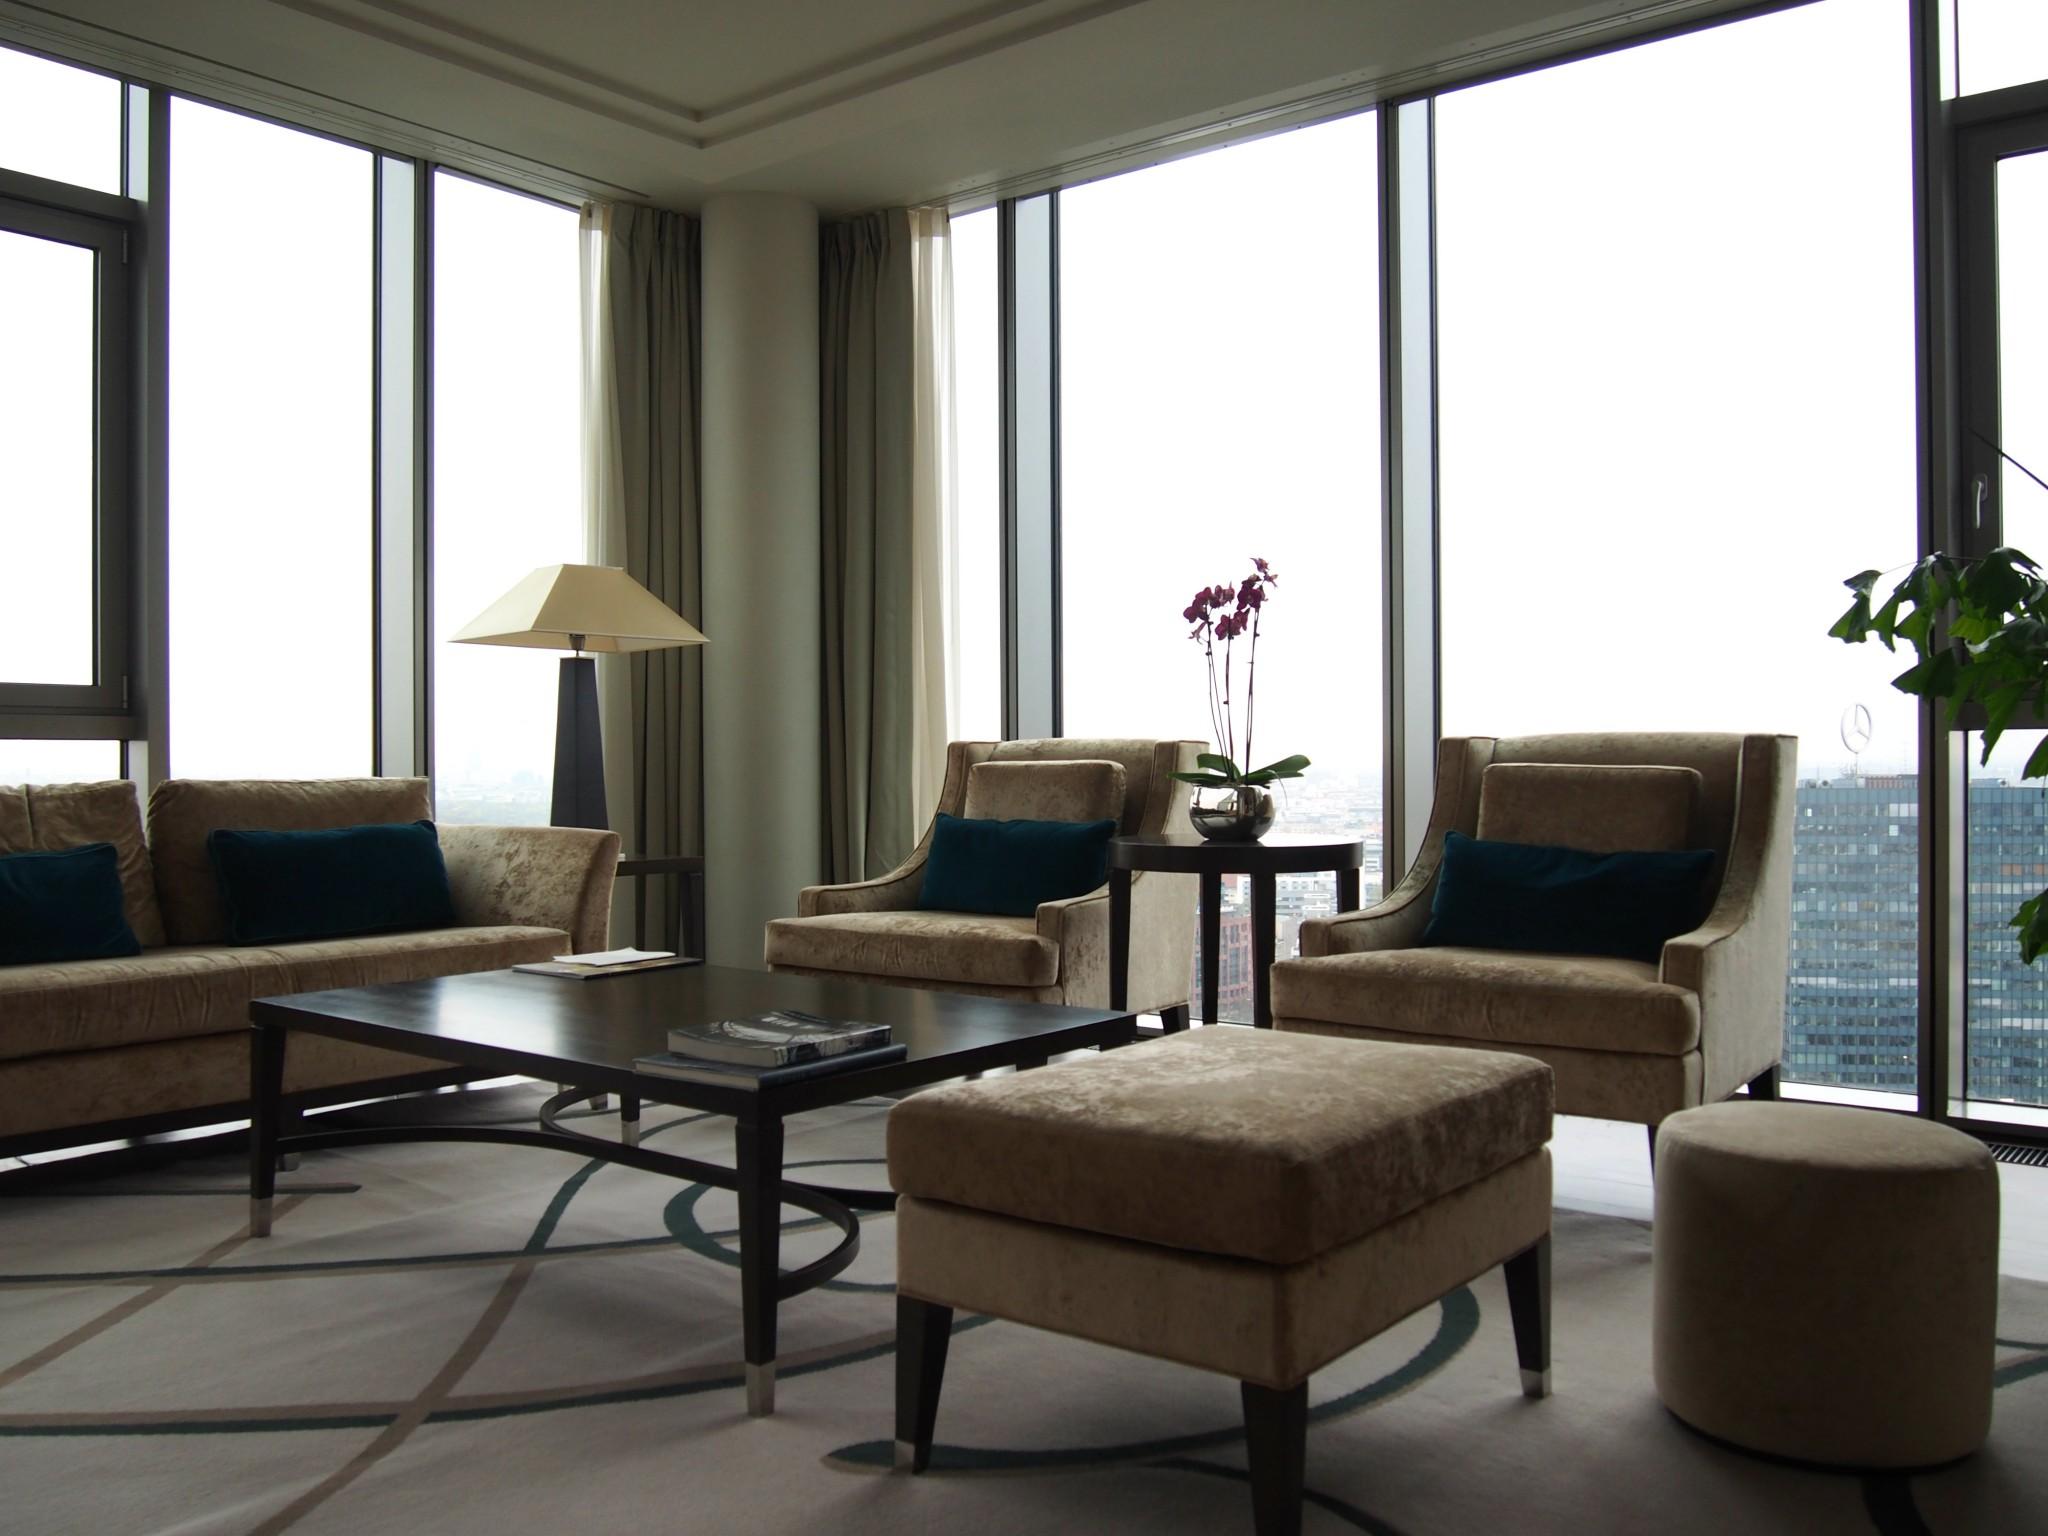 Waldorf Astoria Berlin Tower Suite olohuone 2